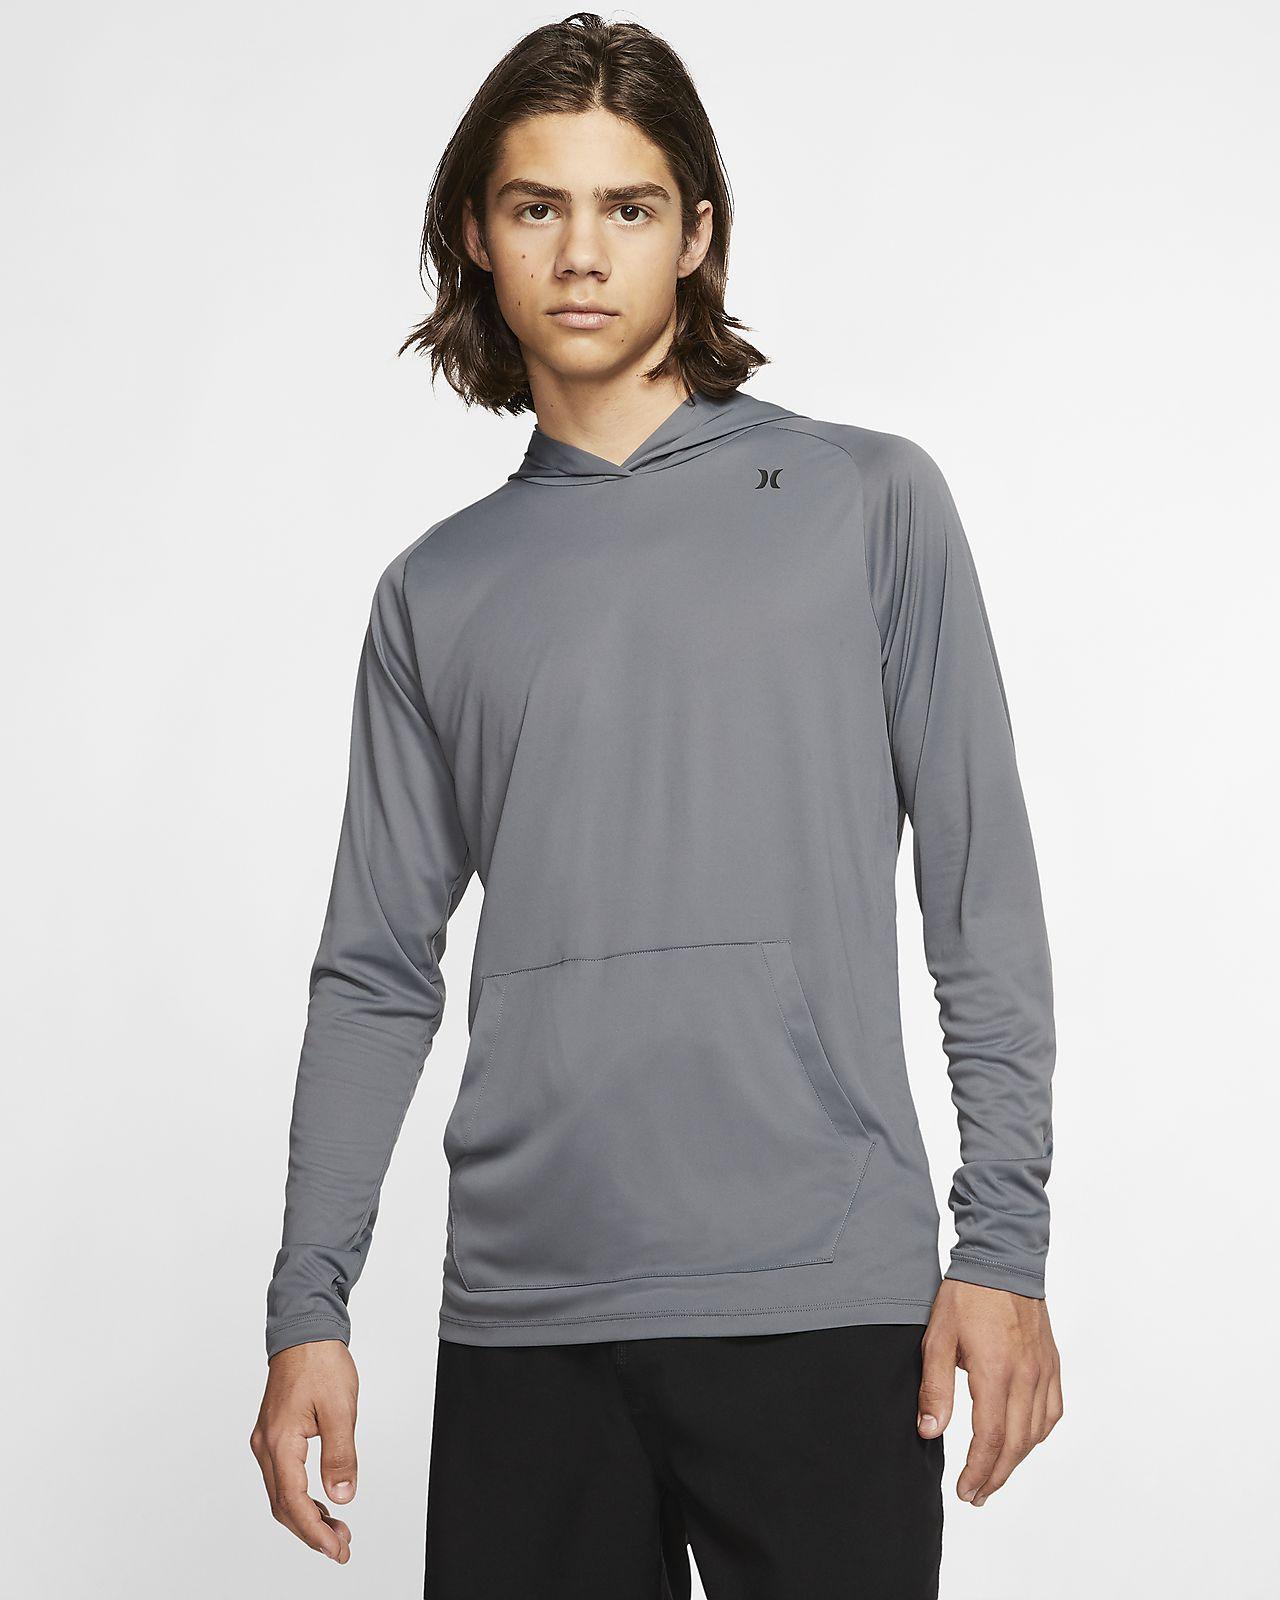 Hurley Quick Dry Erkek Kapüşonlu Sweatshirt'ü